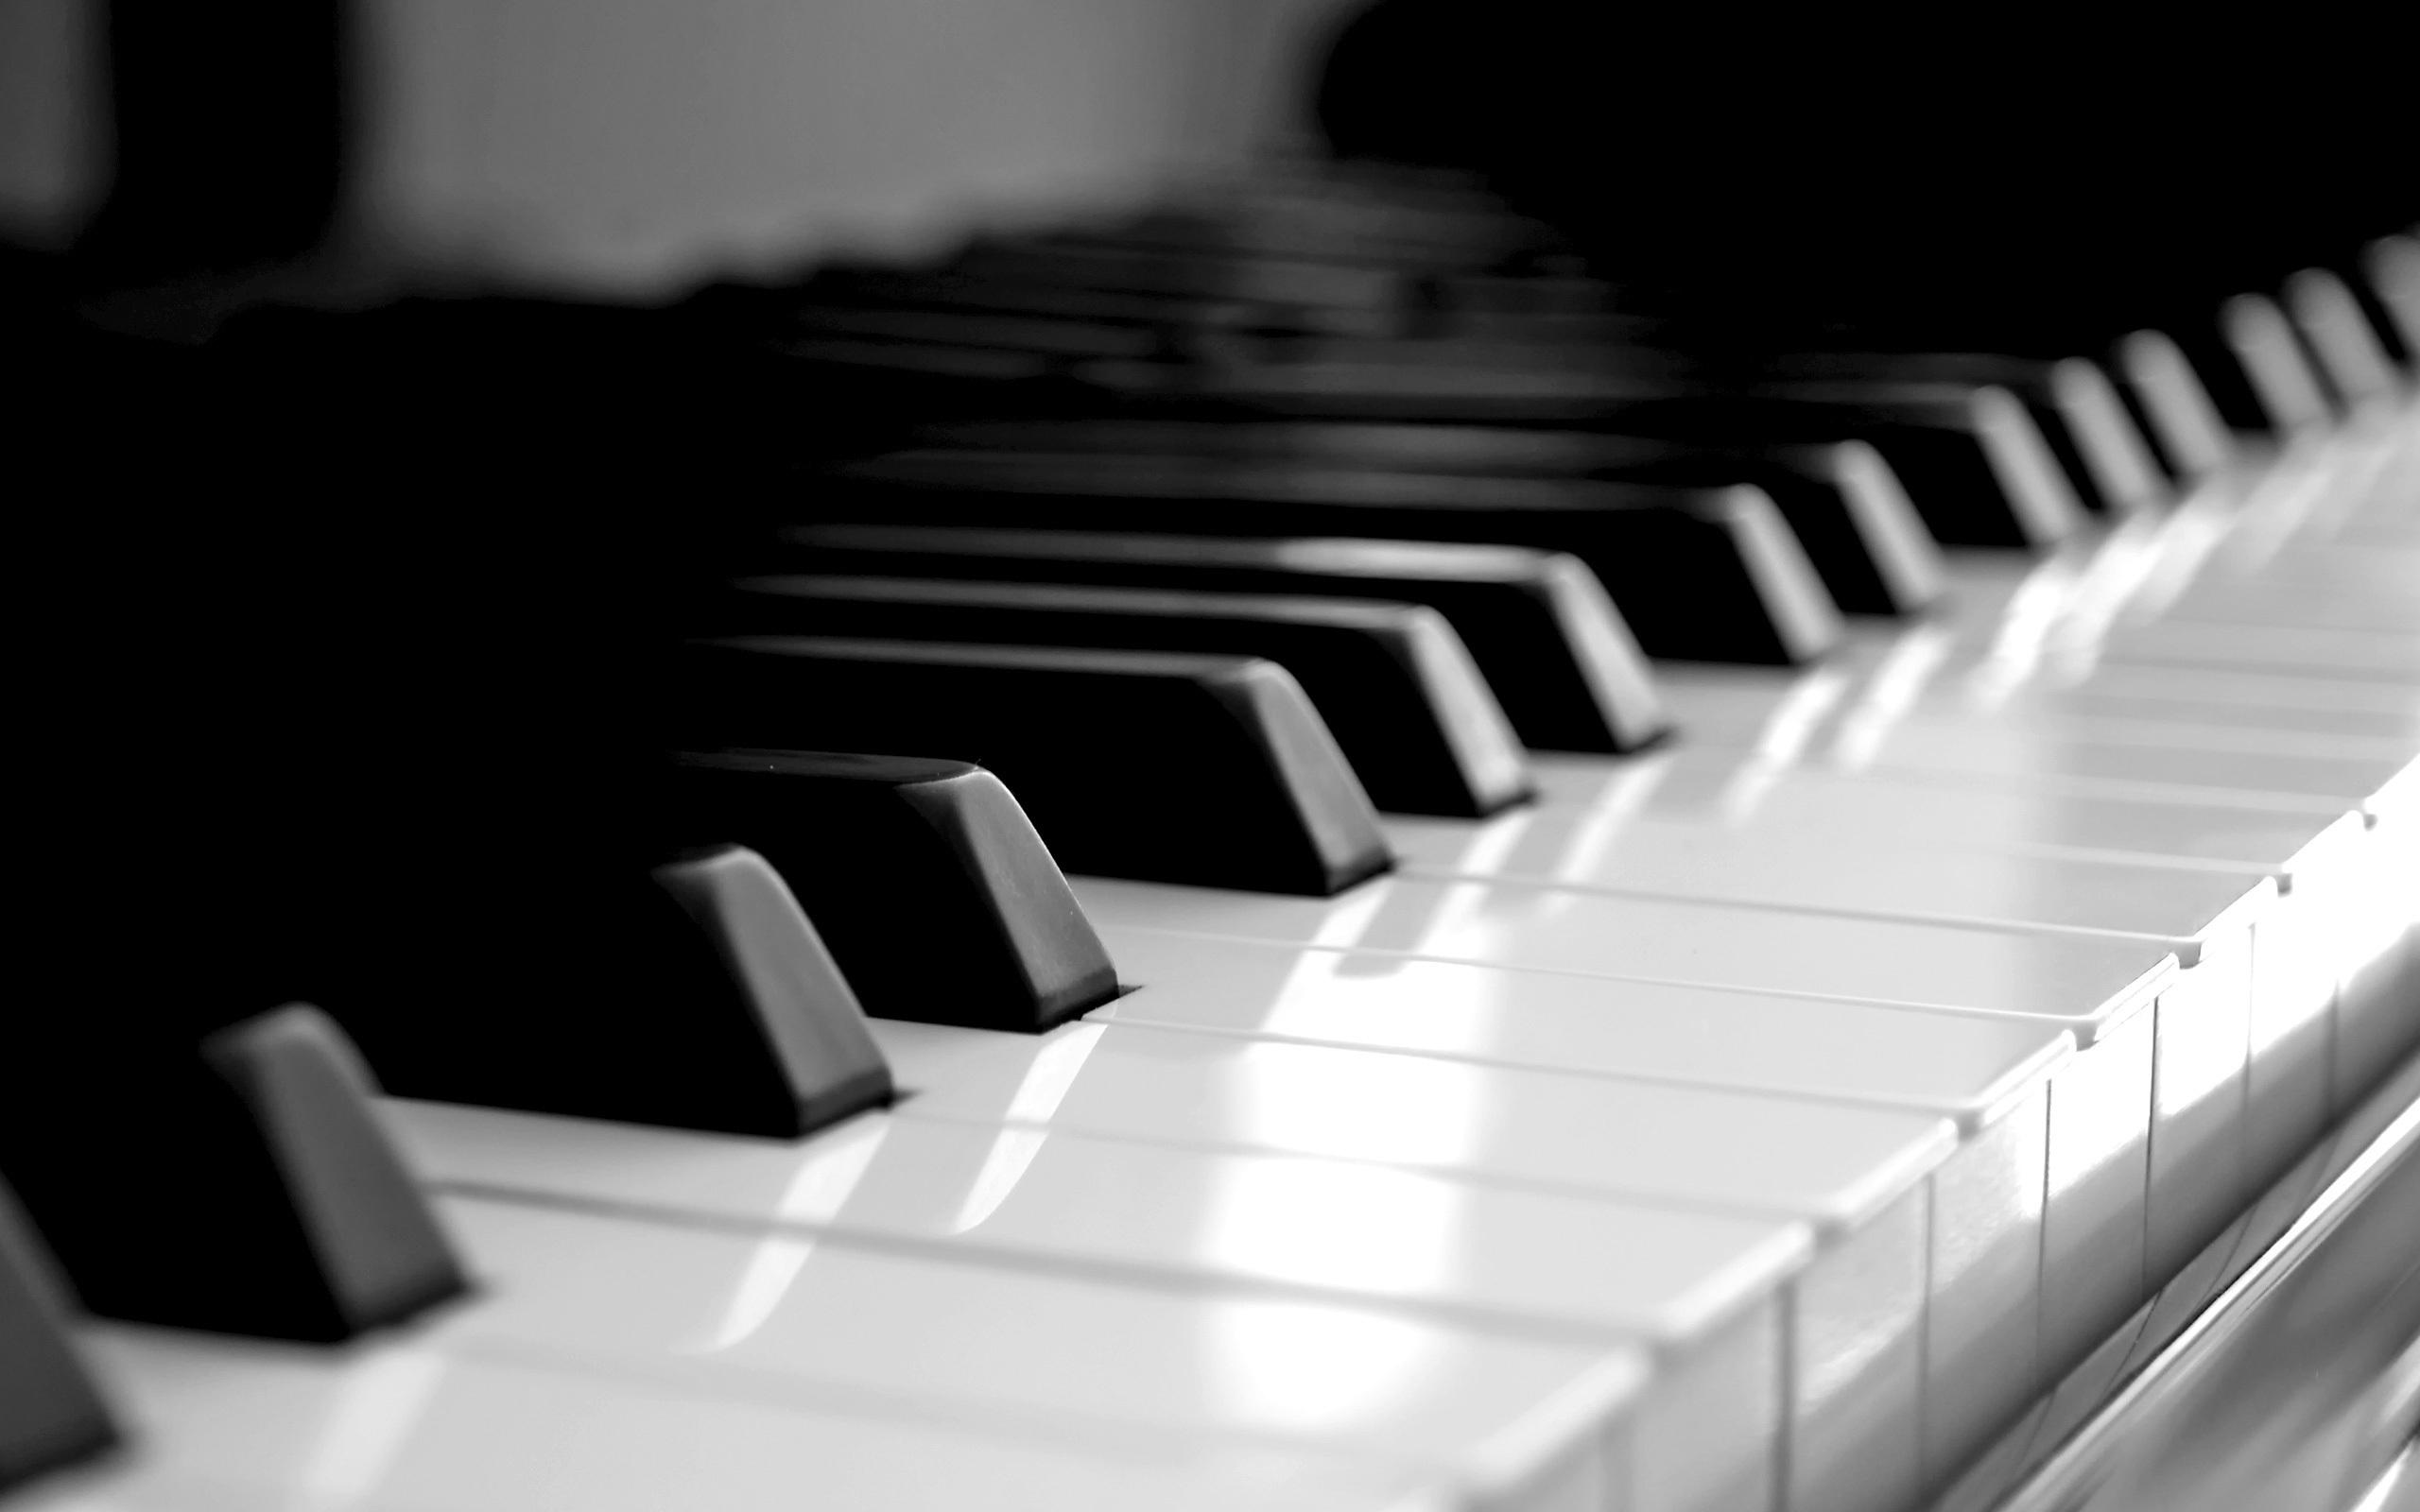 Free Piano Wallpaper